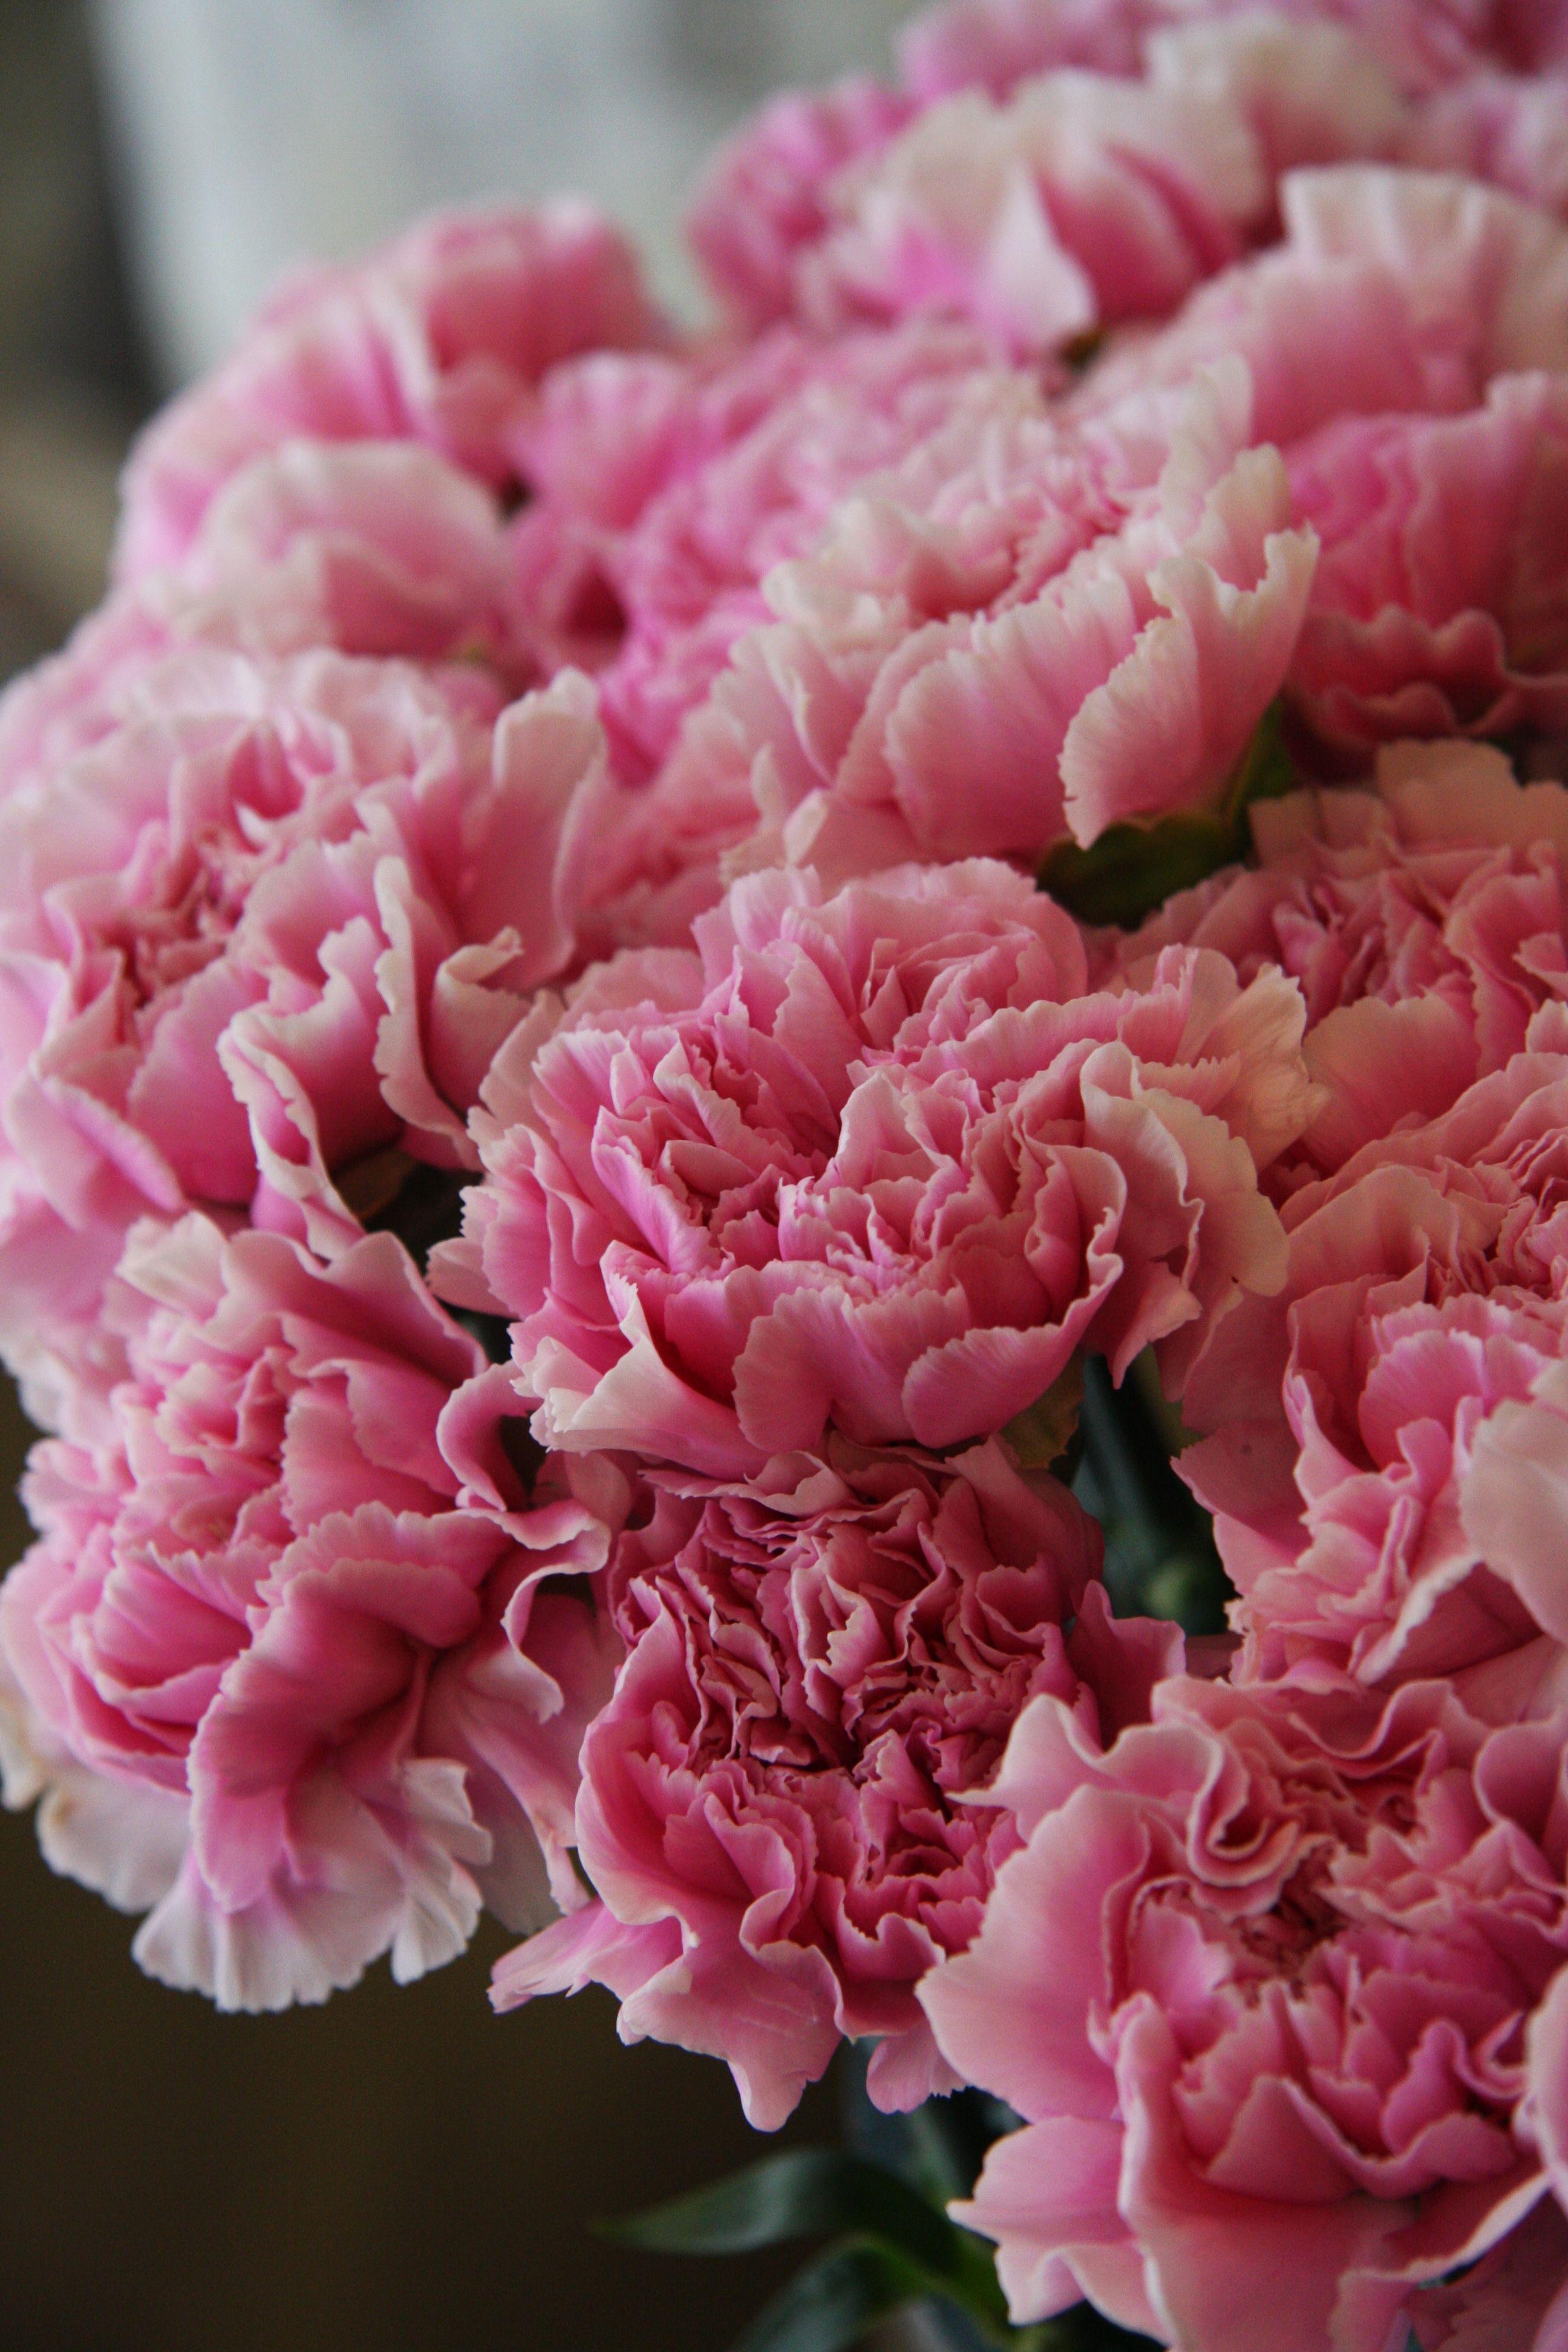 Carnation Strawberry Milk Carnation Flower Carnations Carnation Colors